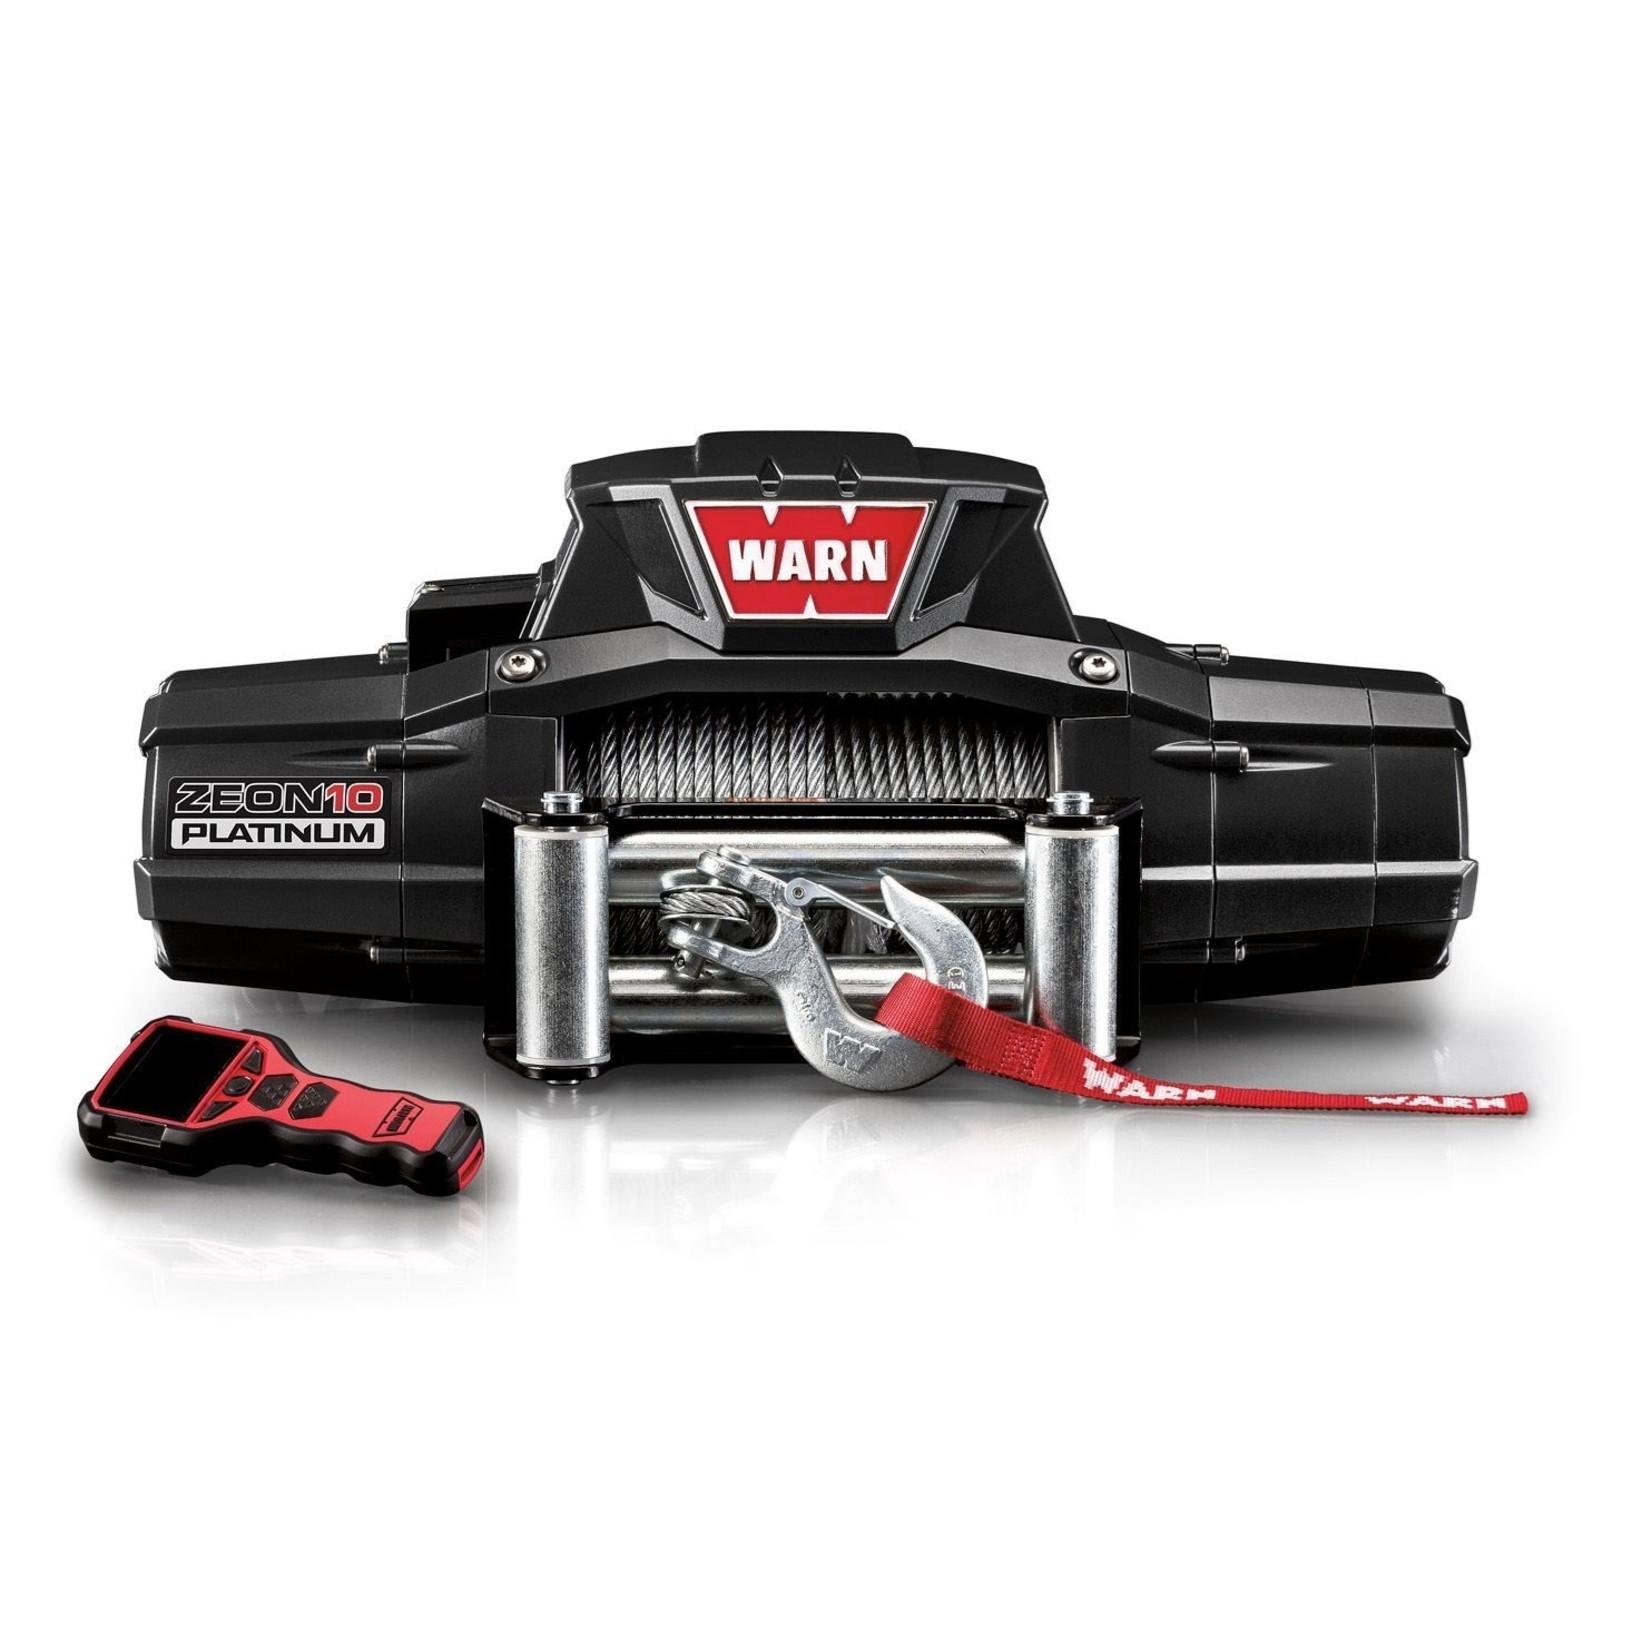 Warn Zeon Platinum 10 Winch w/Steel Cable